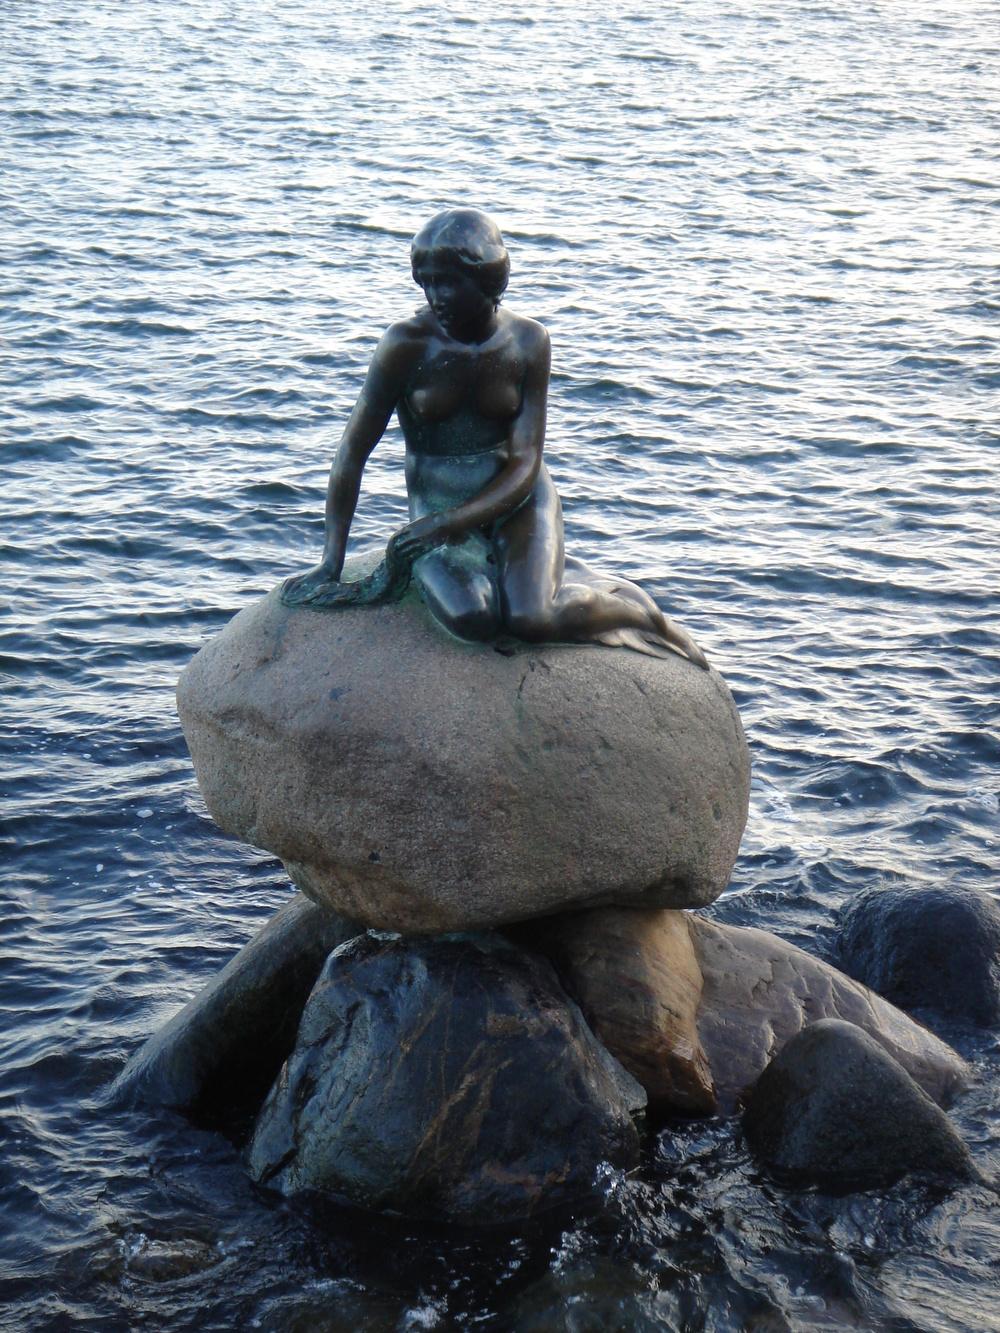 The Little Mermaid - perhaps THE most famous landmark in Copenhagen!